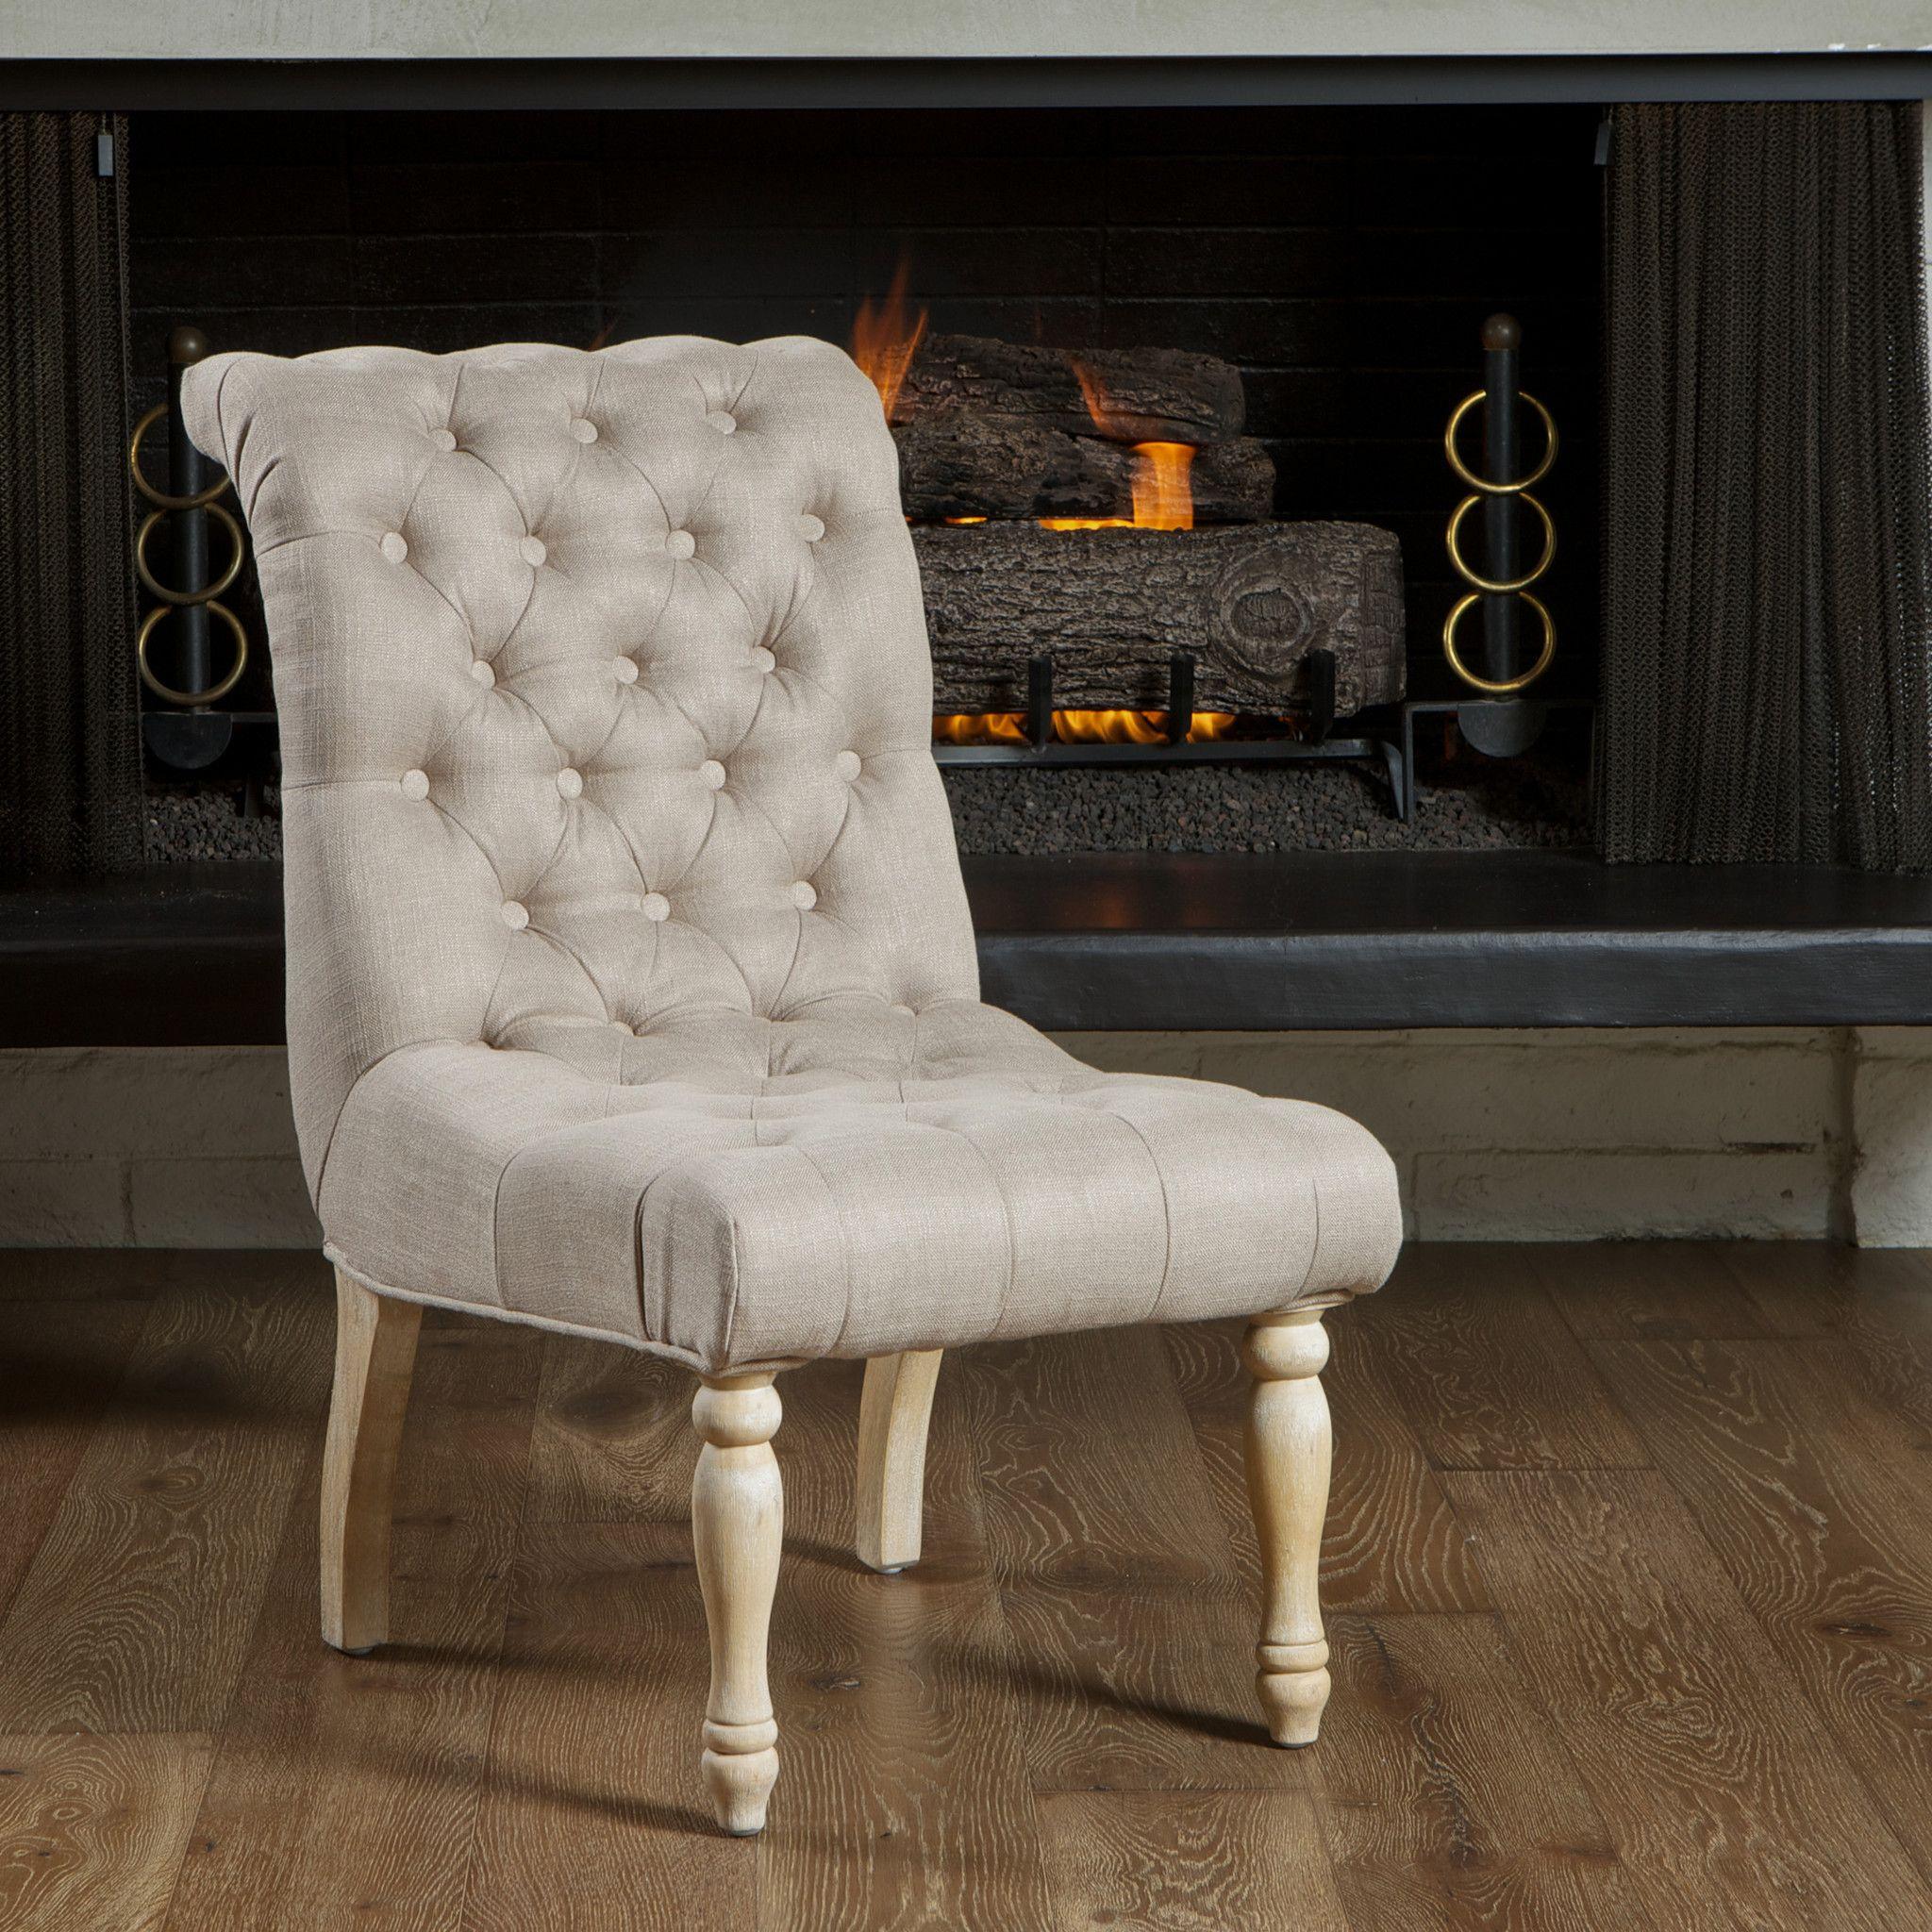 20 Best Minimalist Dining Room Design Ideas For Dinner: Aberdeen Tufted Beige Linen Dining Chair